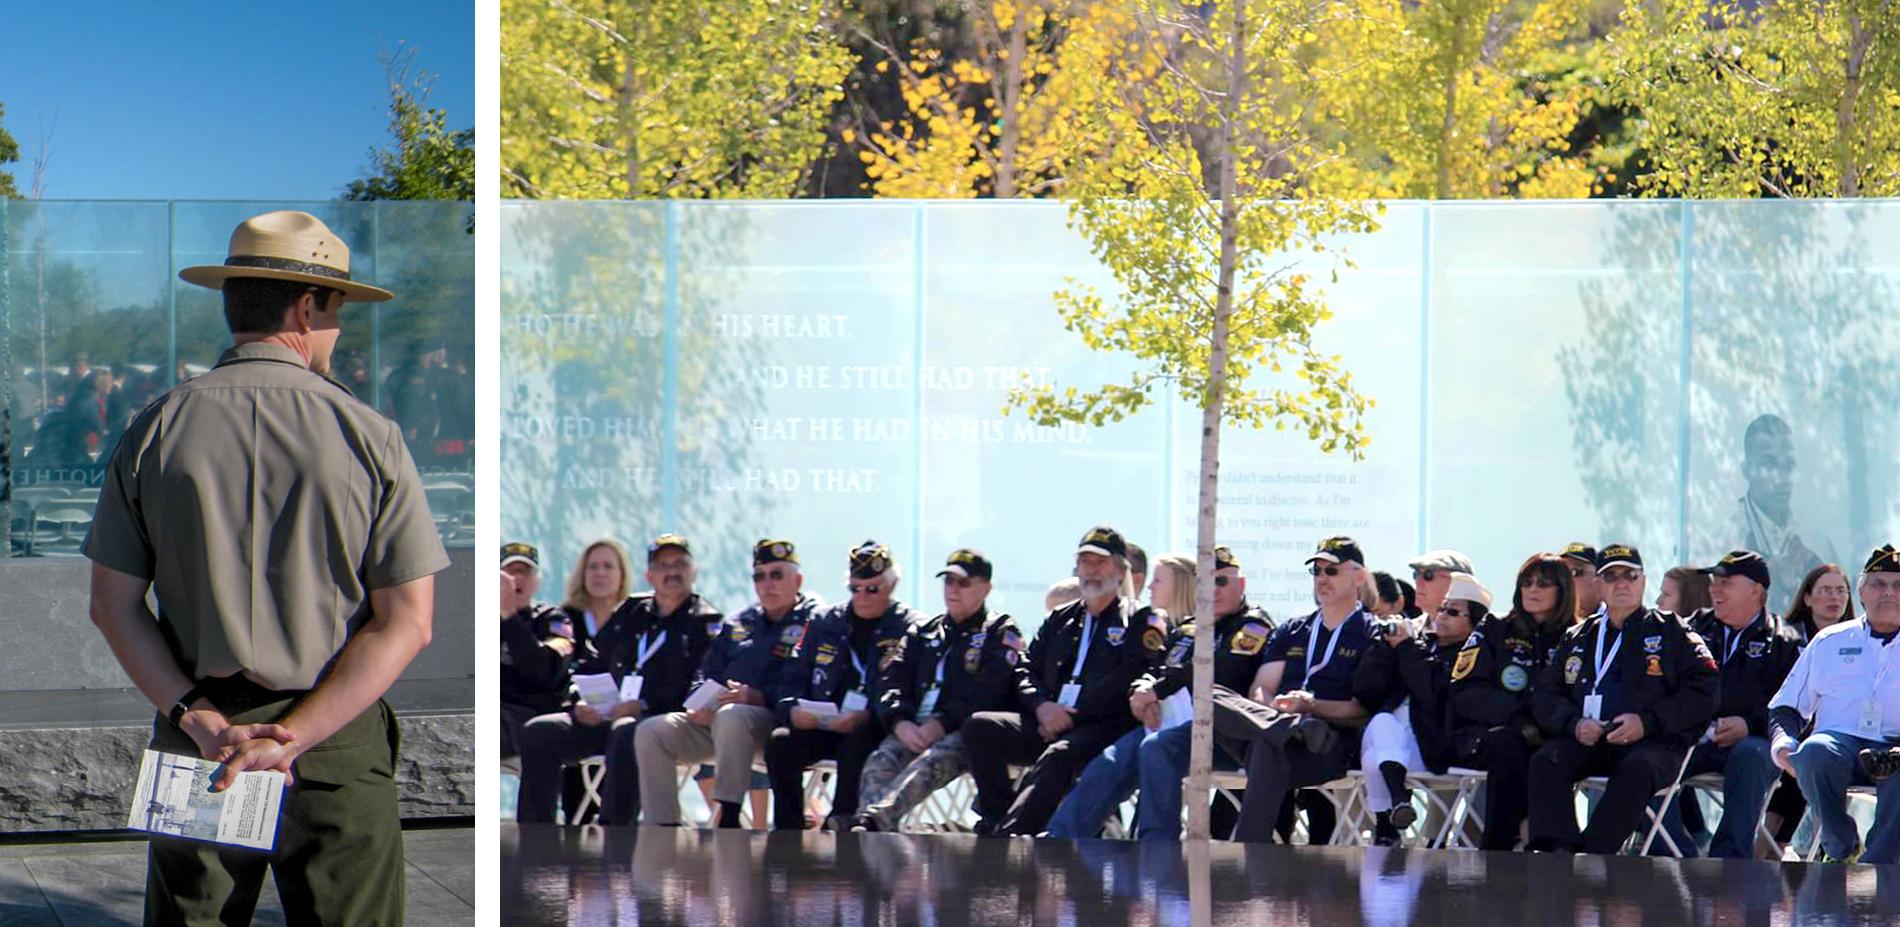 Gathering at the Memorial